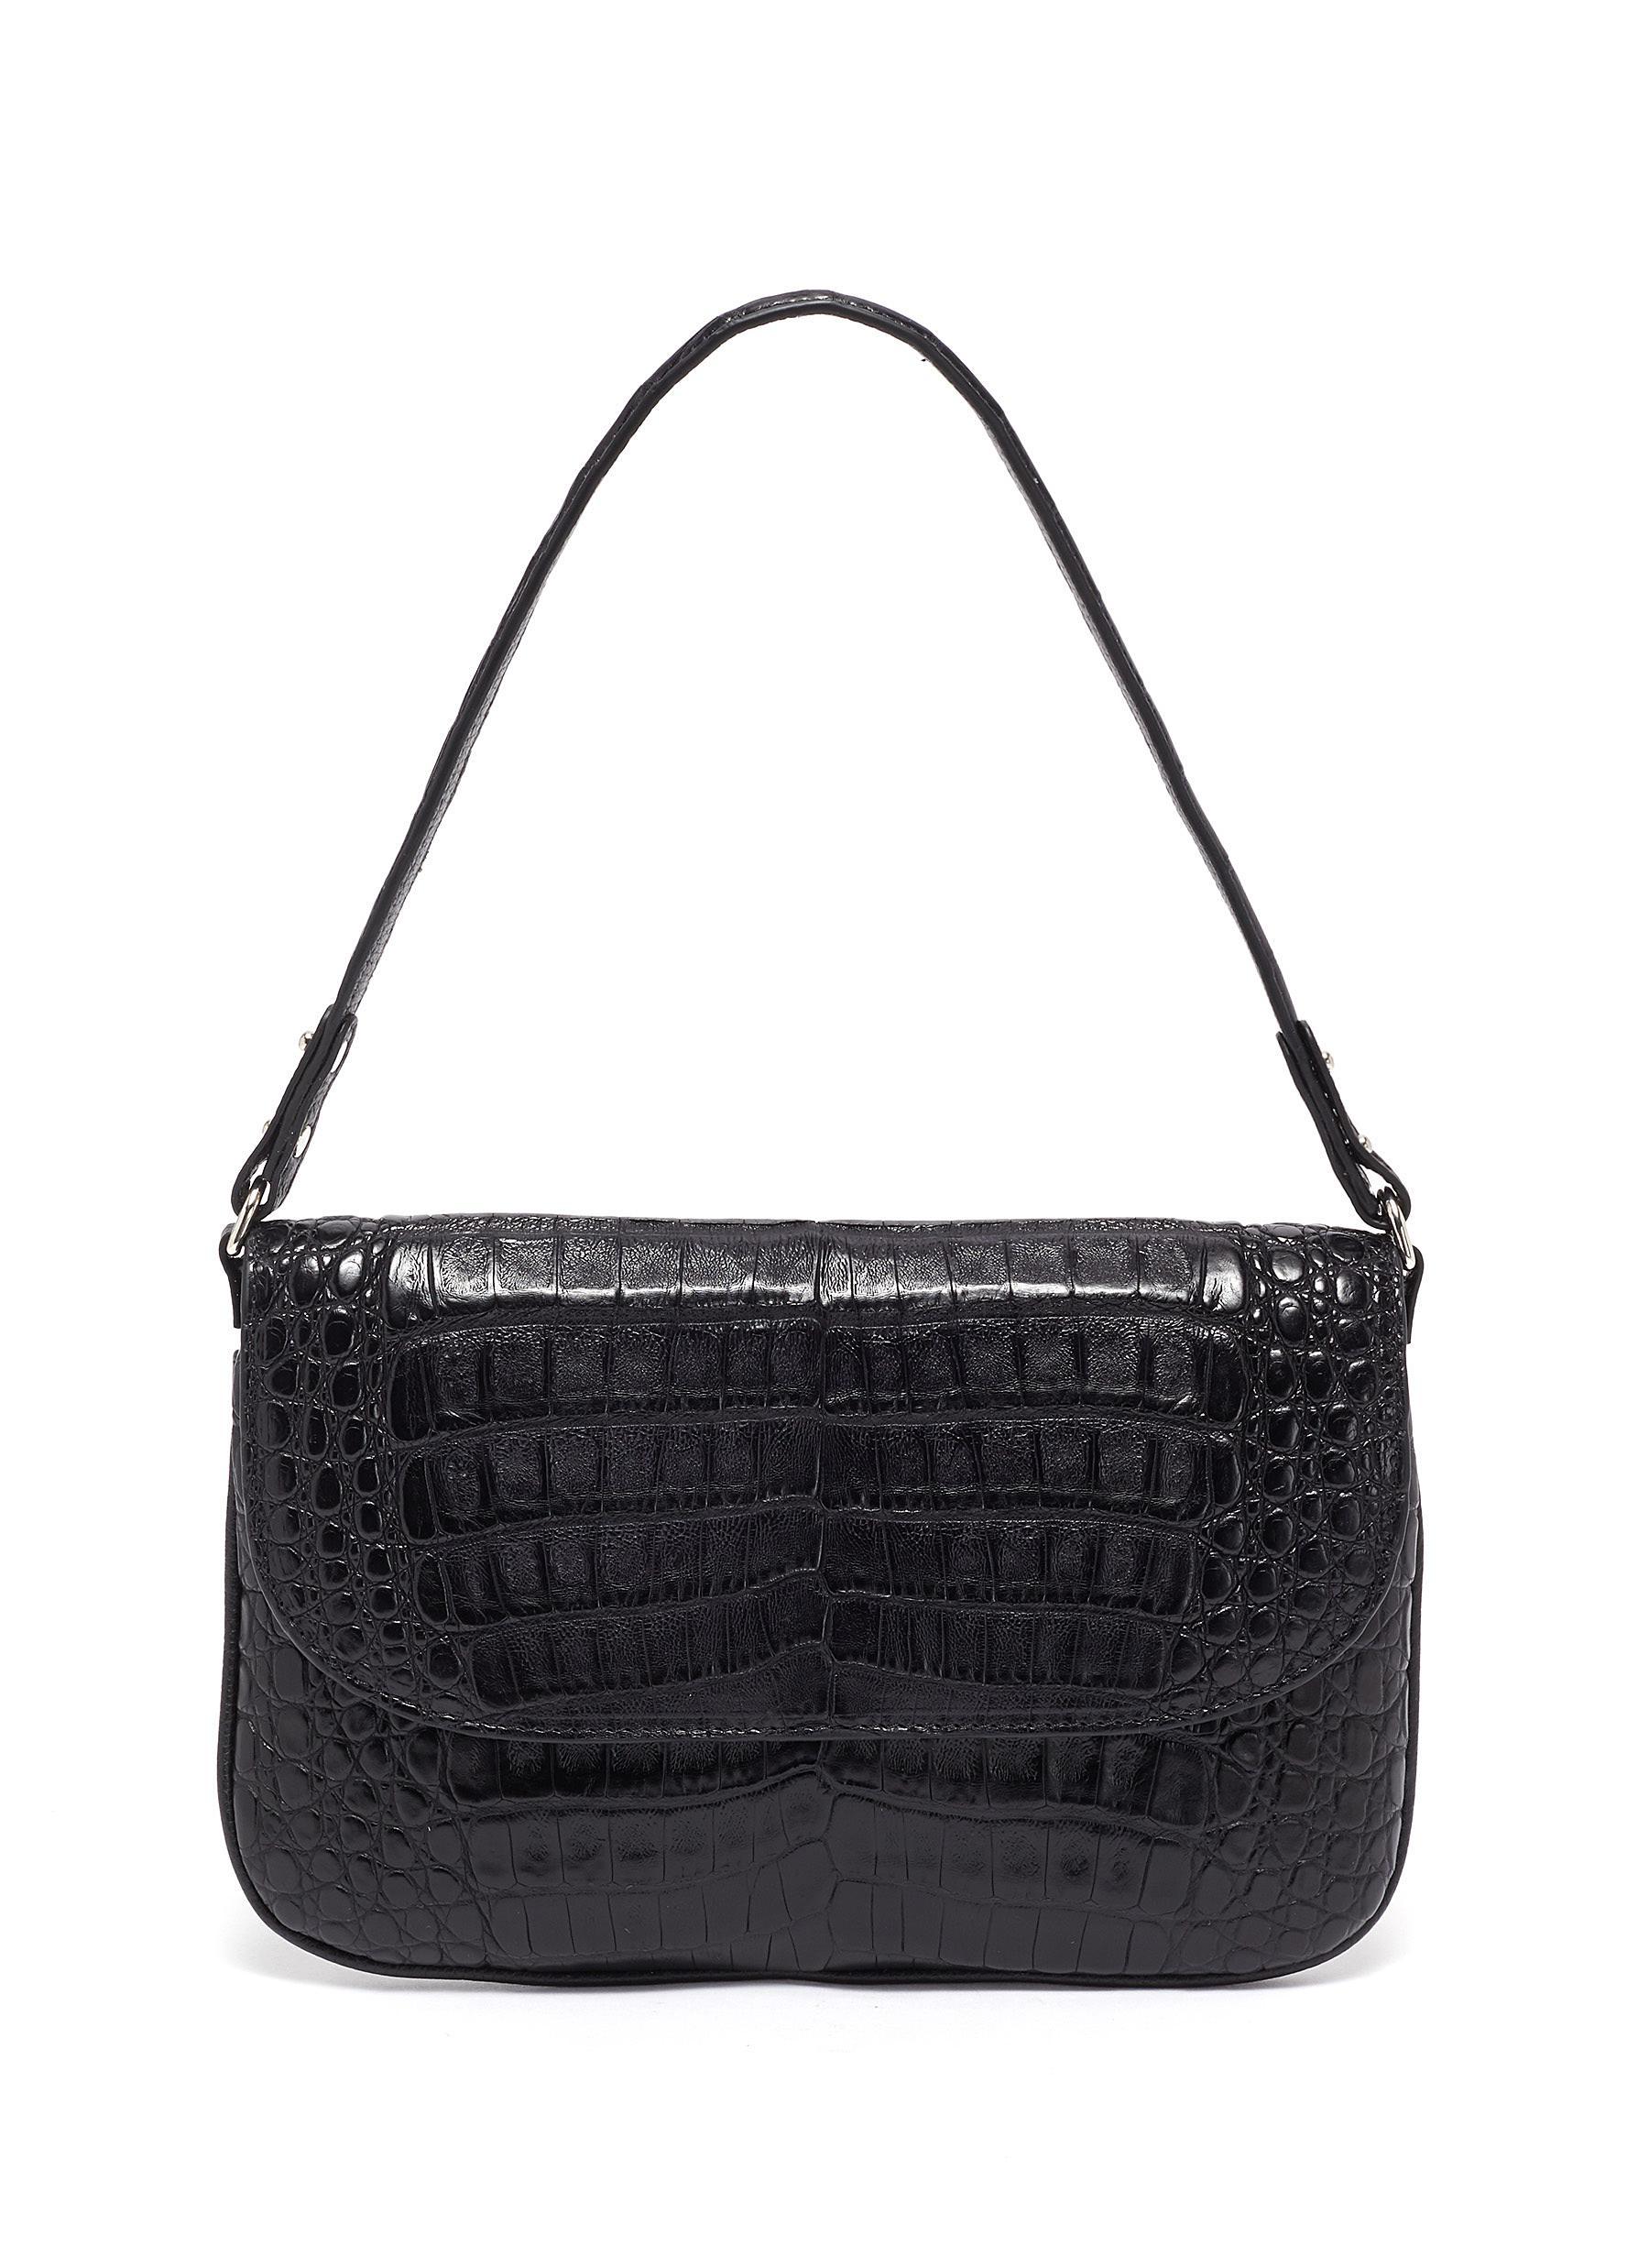 Luisa' Matte Crocodile Leather Pouch